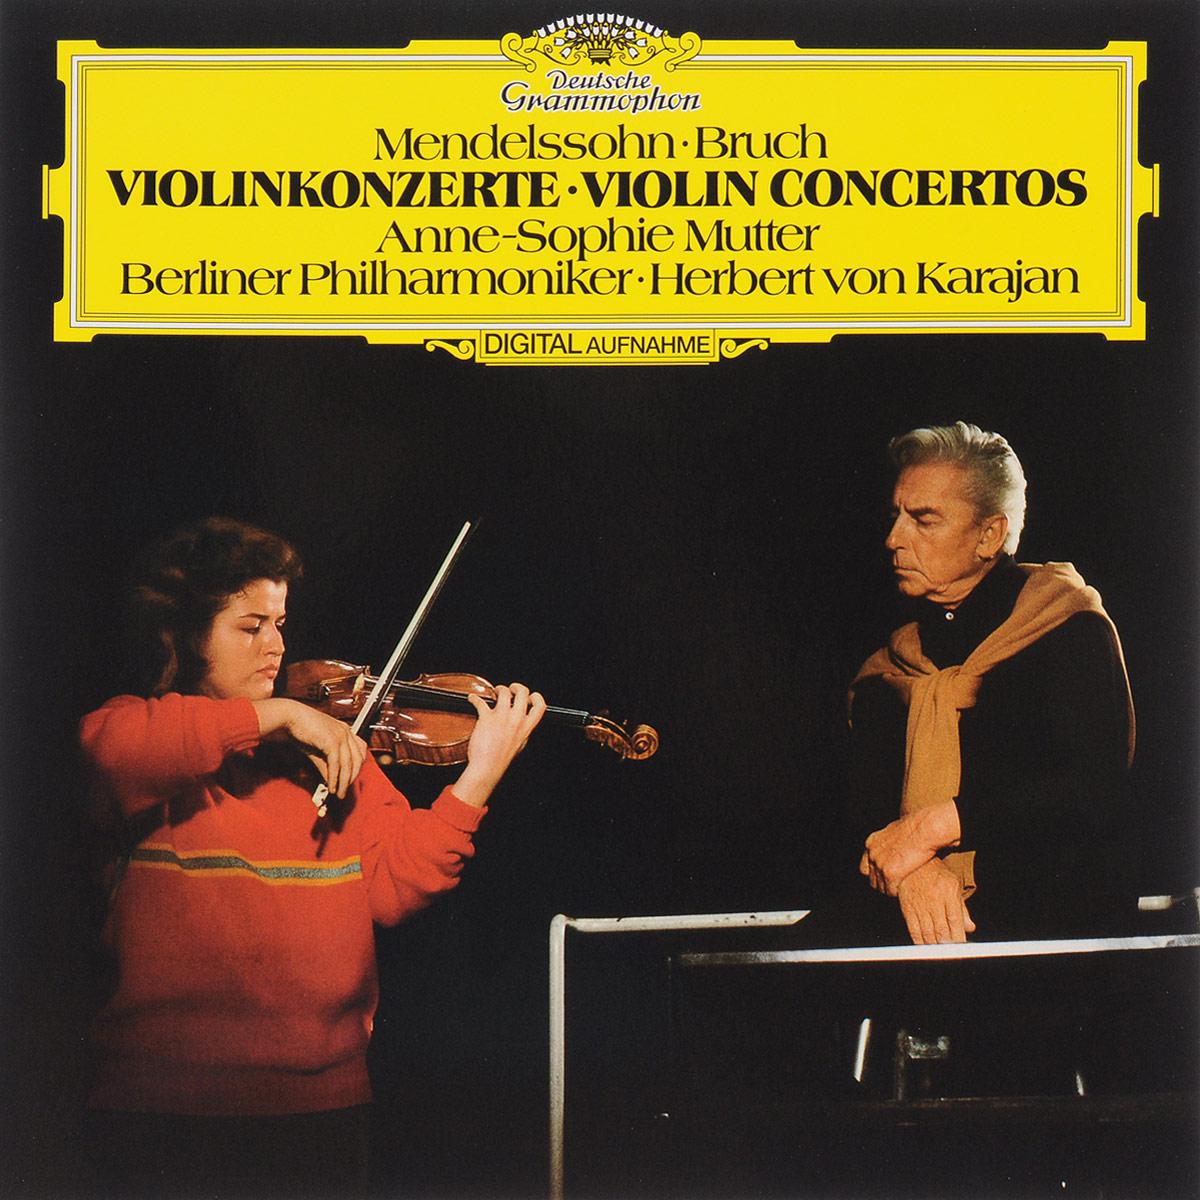 лучшая цена Герберт Караян,Berliner Philharmoniker Herbert Von Karajan. Mendelssohn / Bruch. Violin Concertos (LP)